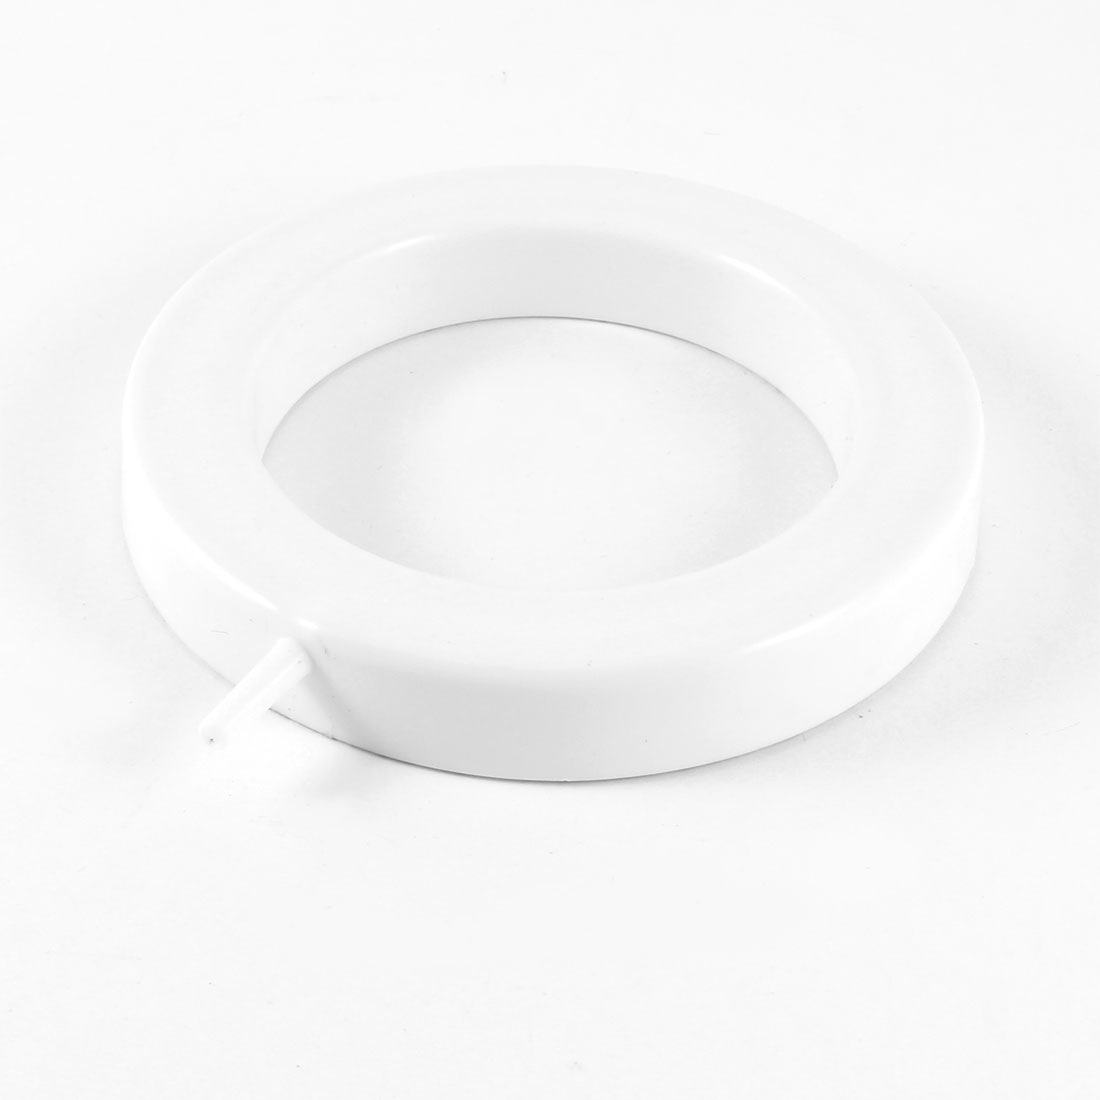 "White 3mm Connector Aquarium Airstone Aerator Air Bubble Disk 5.0"" Dia"